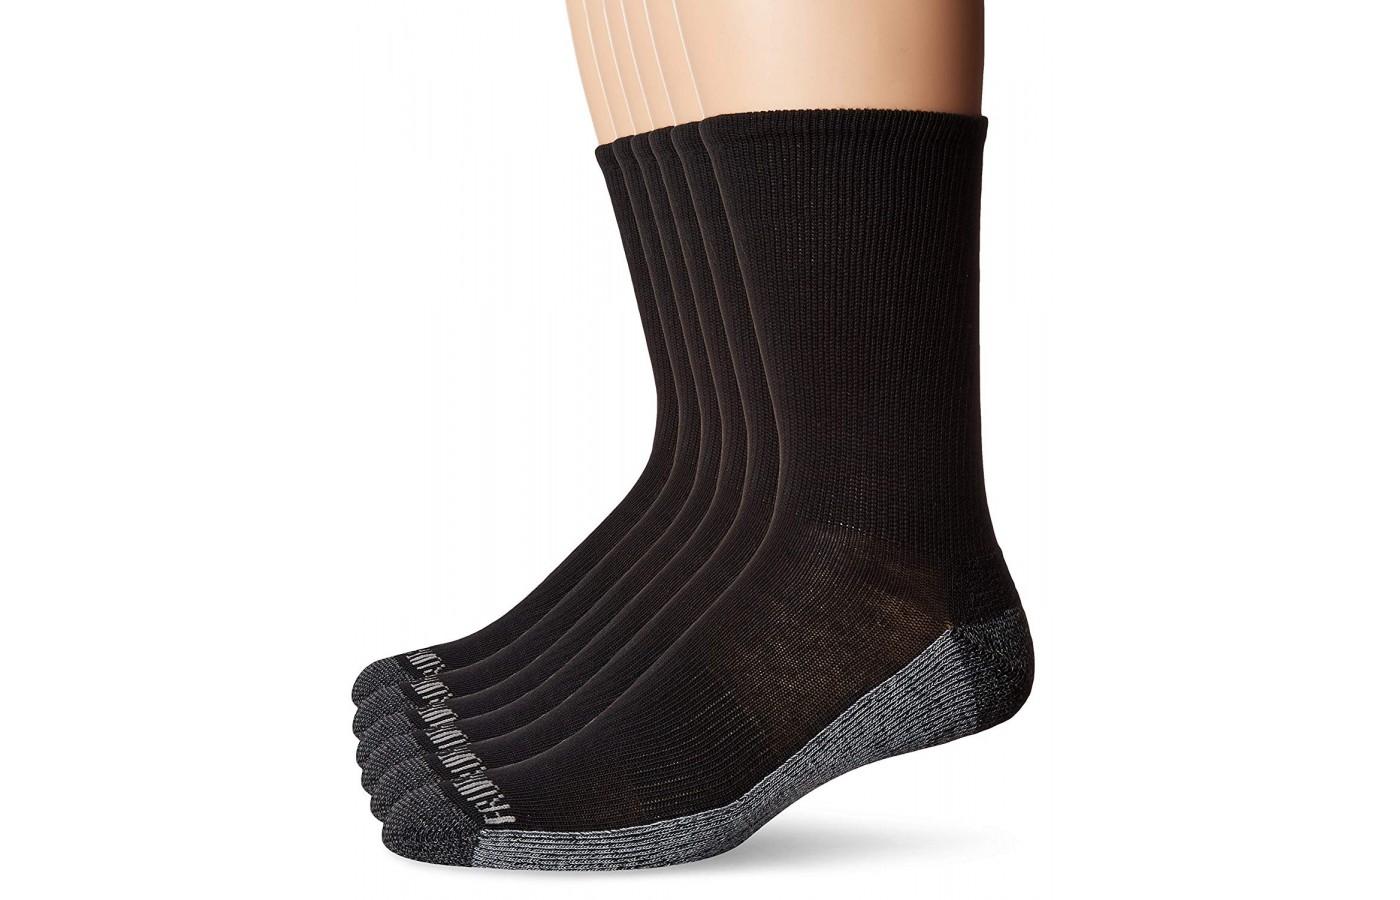 Fruit of the Loom Crew Socks black